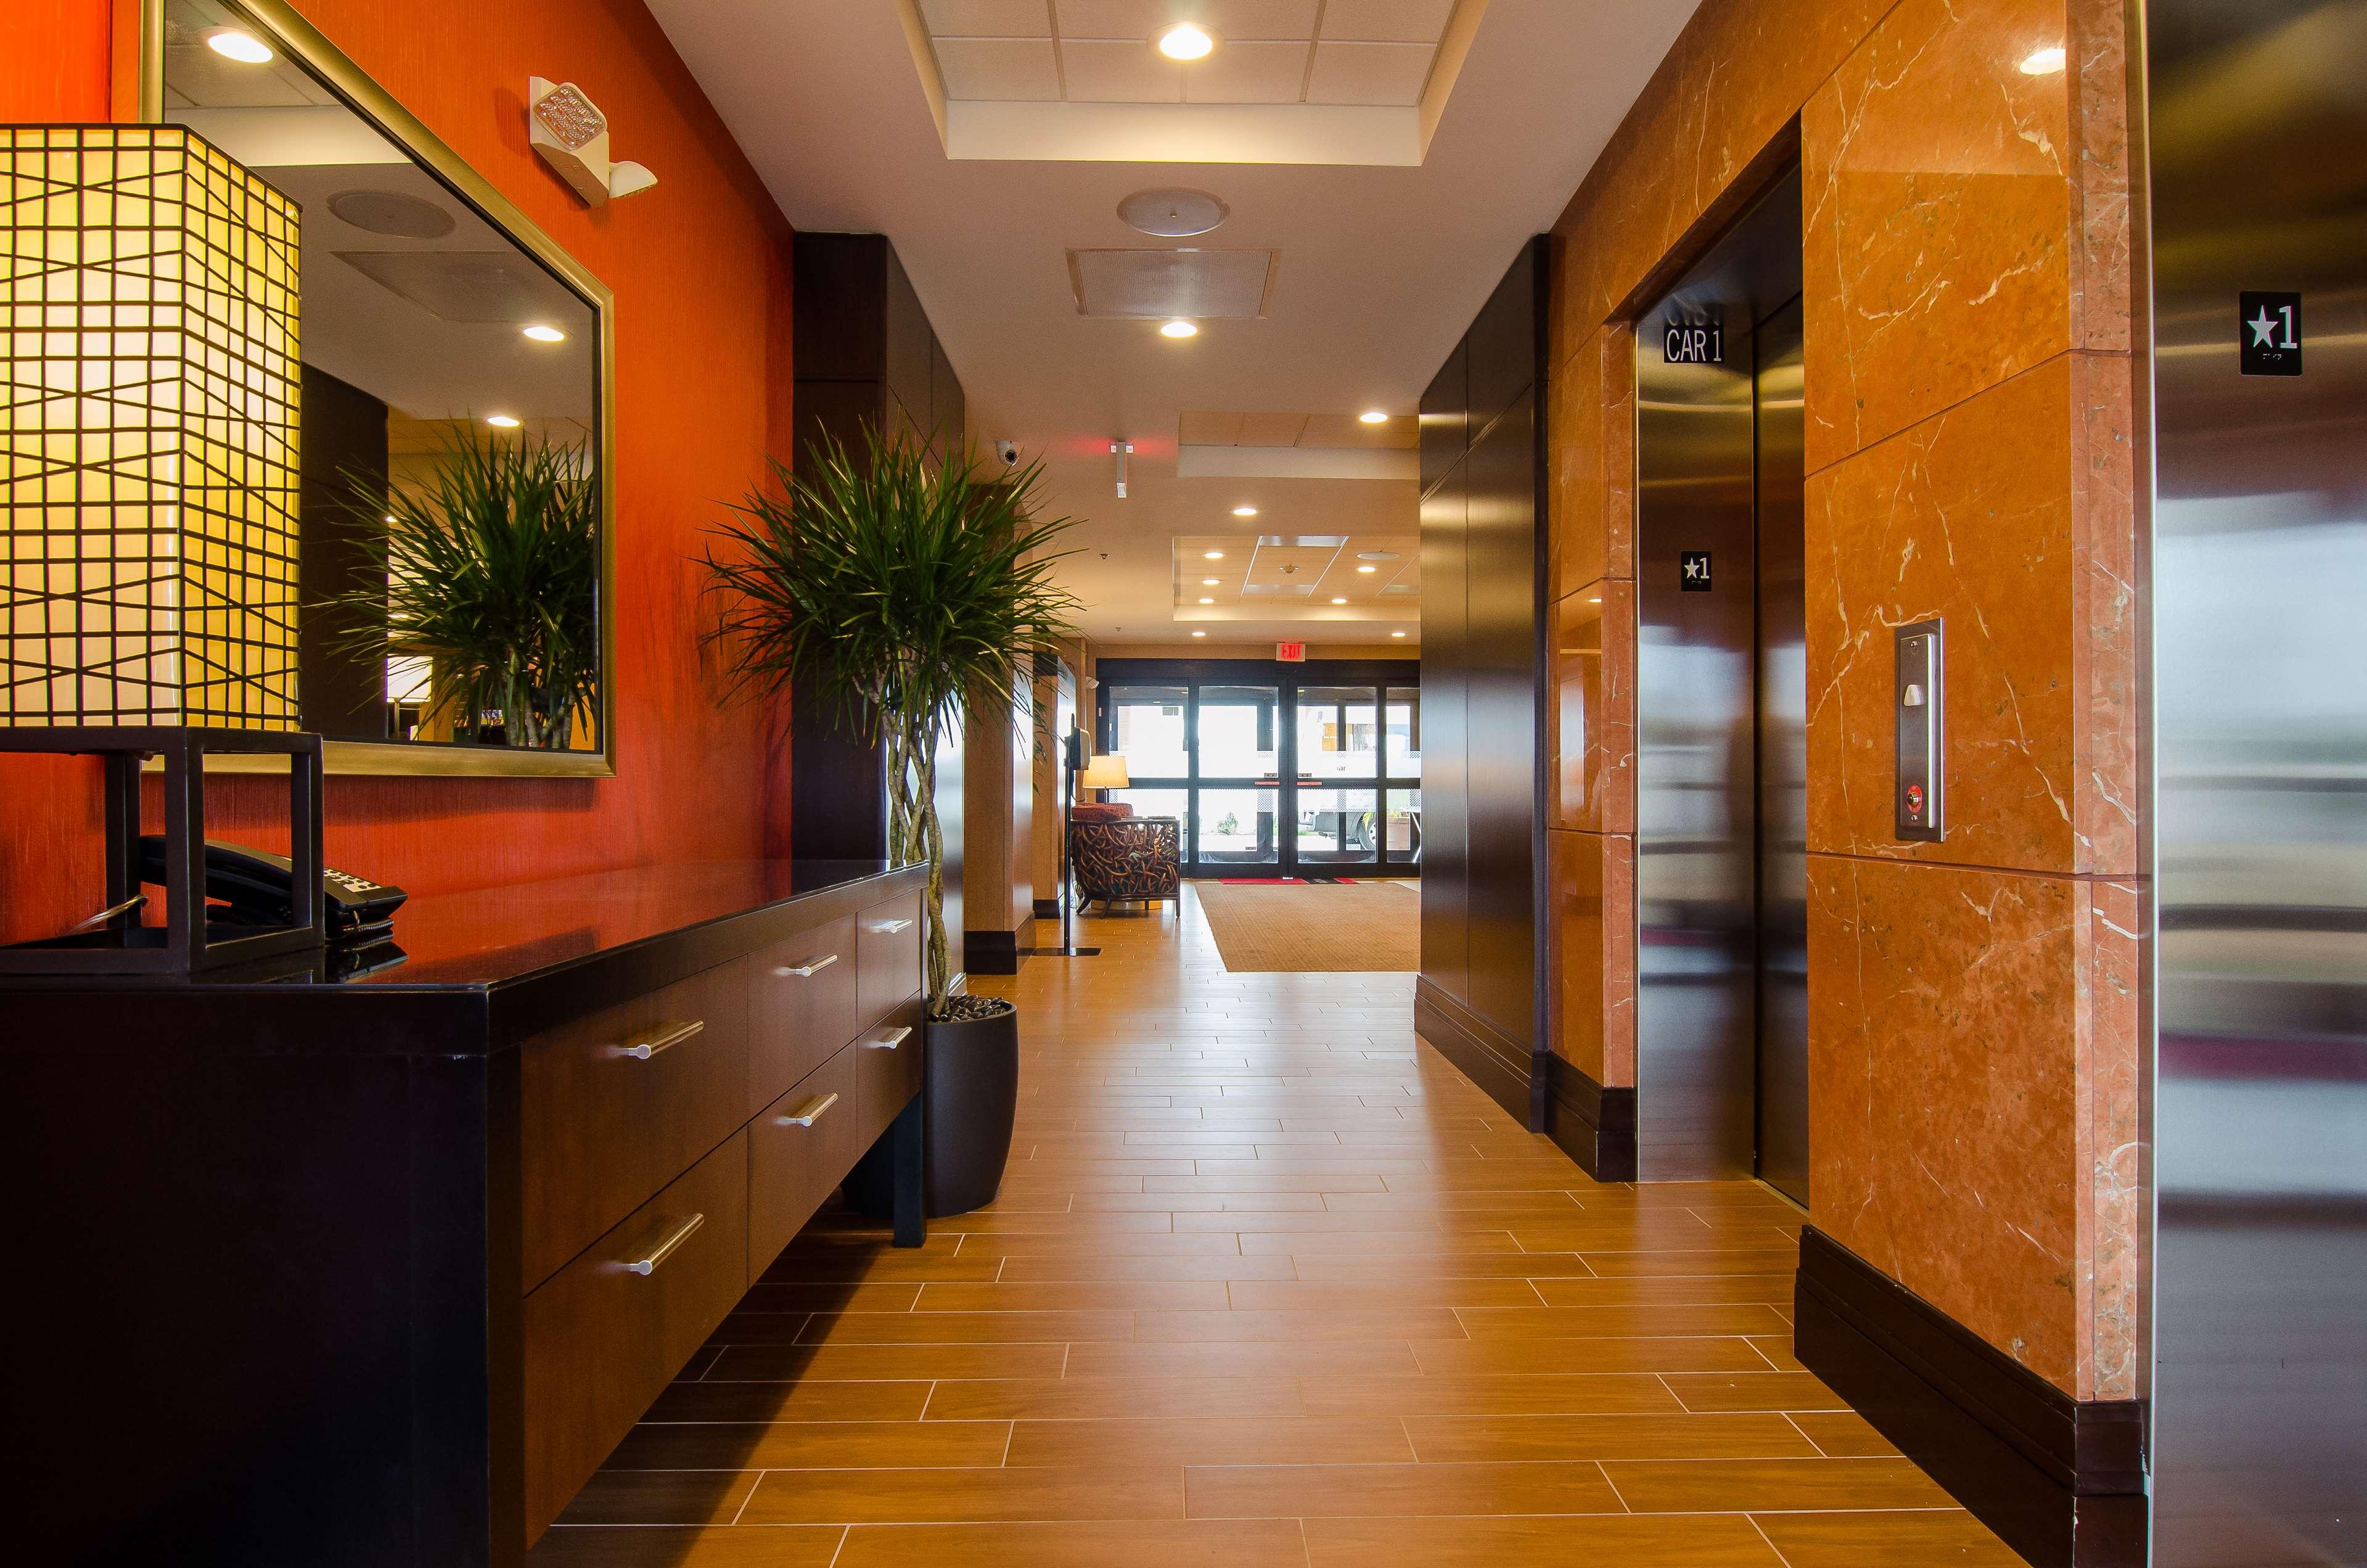 Hampton Inn & Suites Houston North IAH image 5